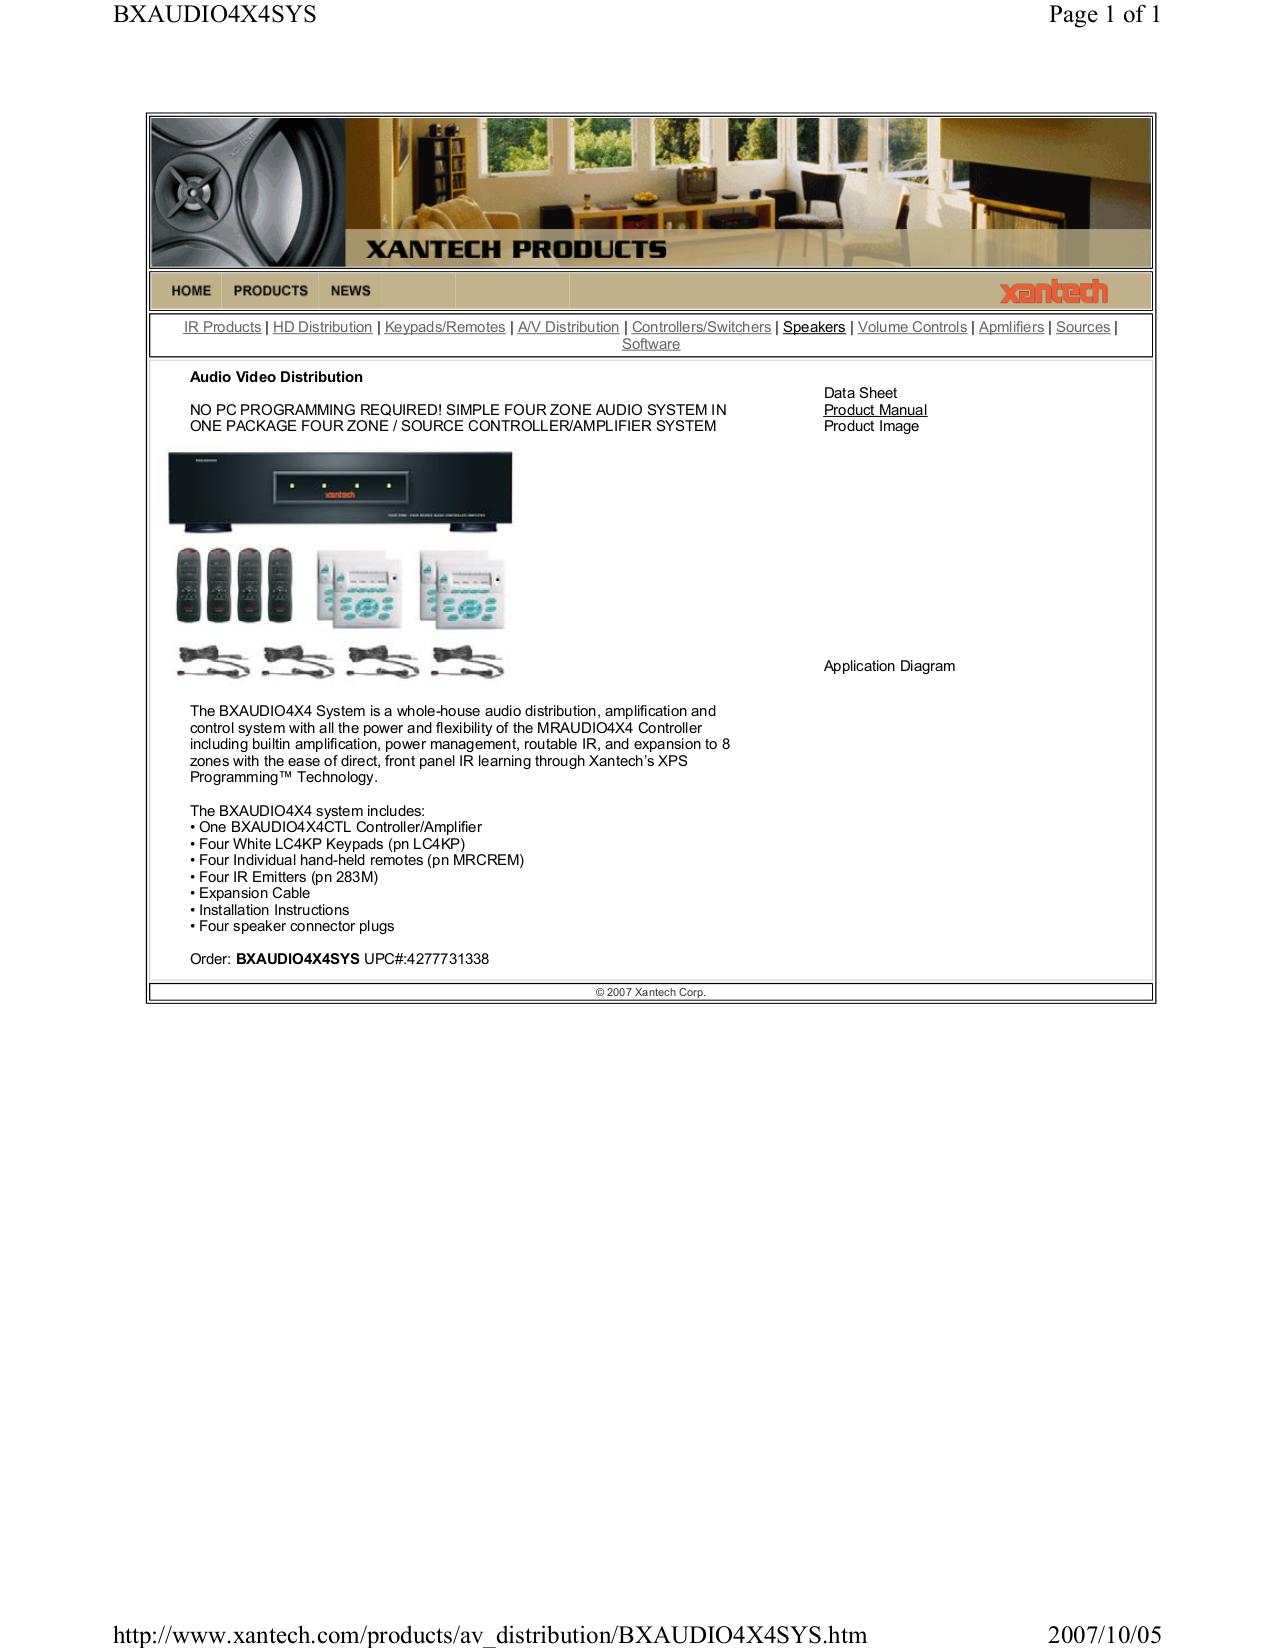 pdf for Xantech Amp BXAUDIO4X4 manual